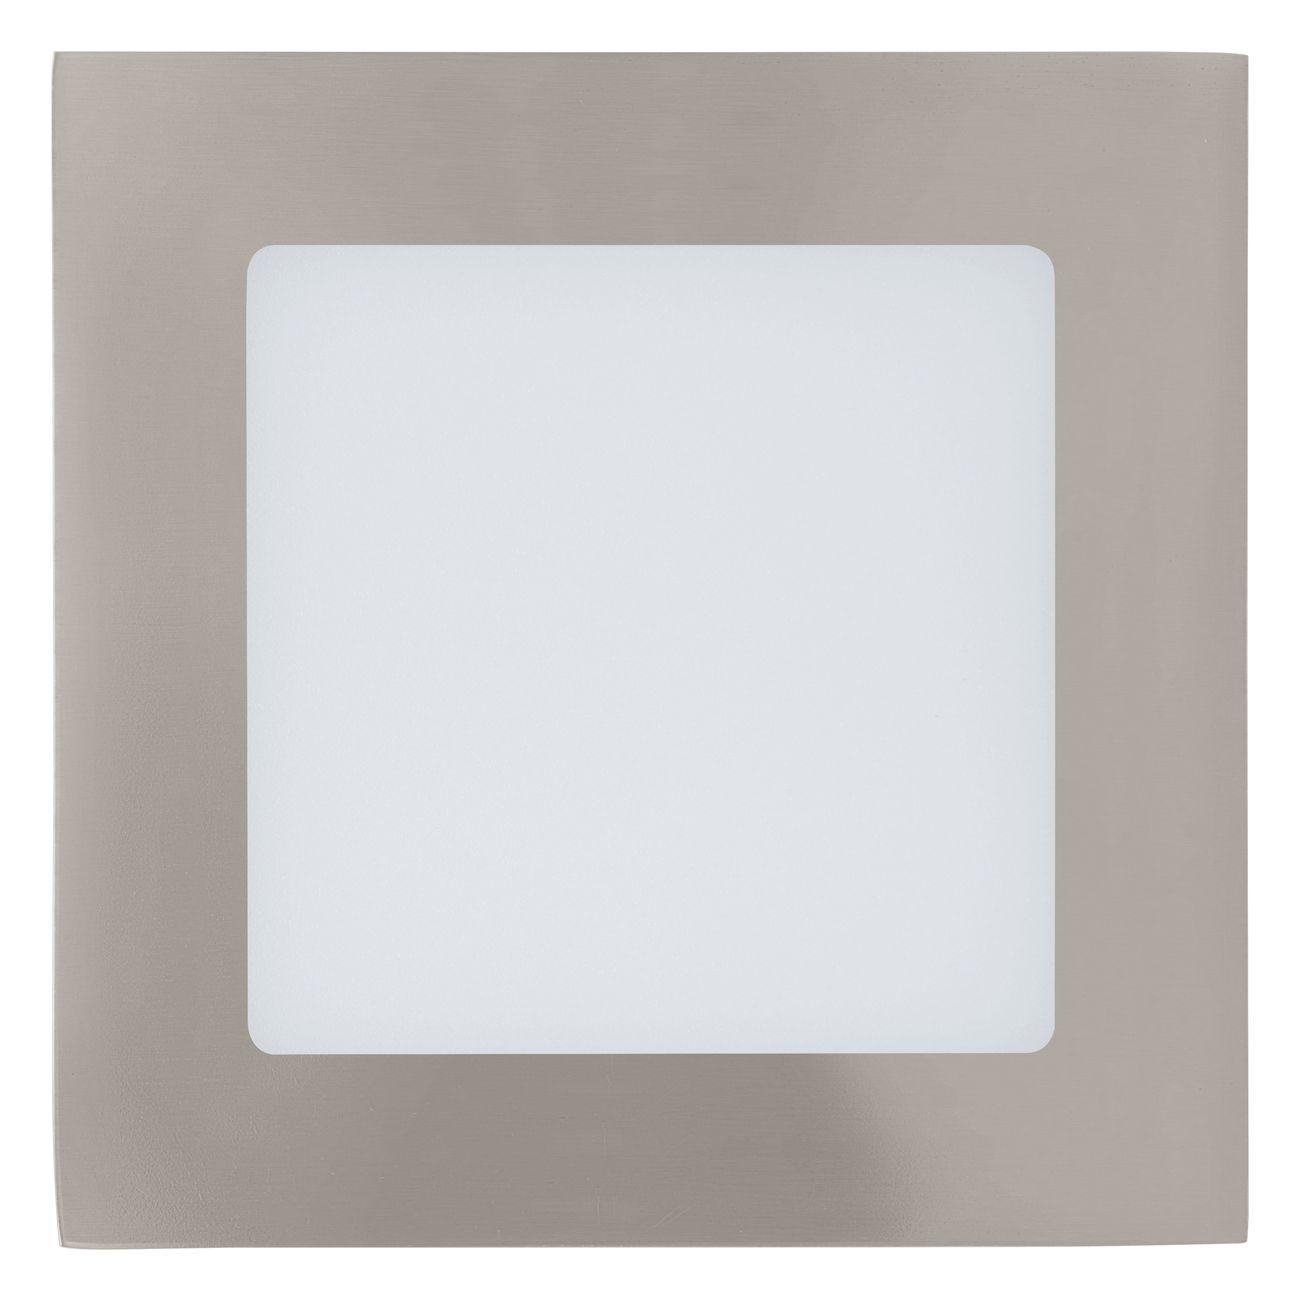 Plafoniera cu LED incastrabila Eglo Fueva 1 colectia Style 11W 600 lm 12x12x2 5cm alb poza